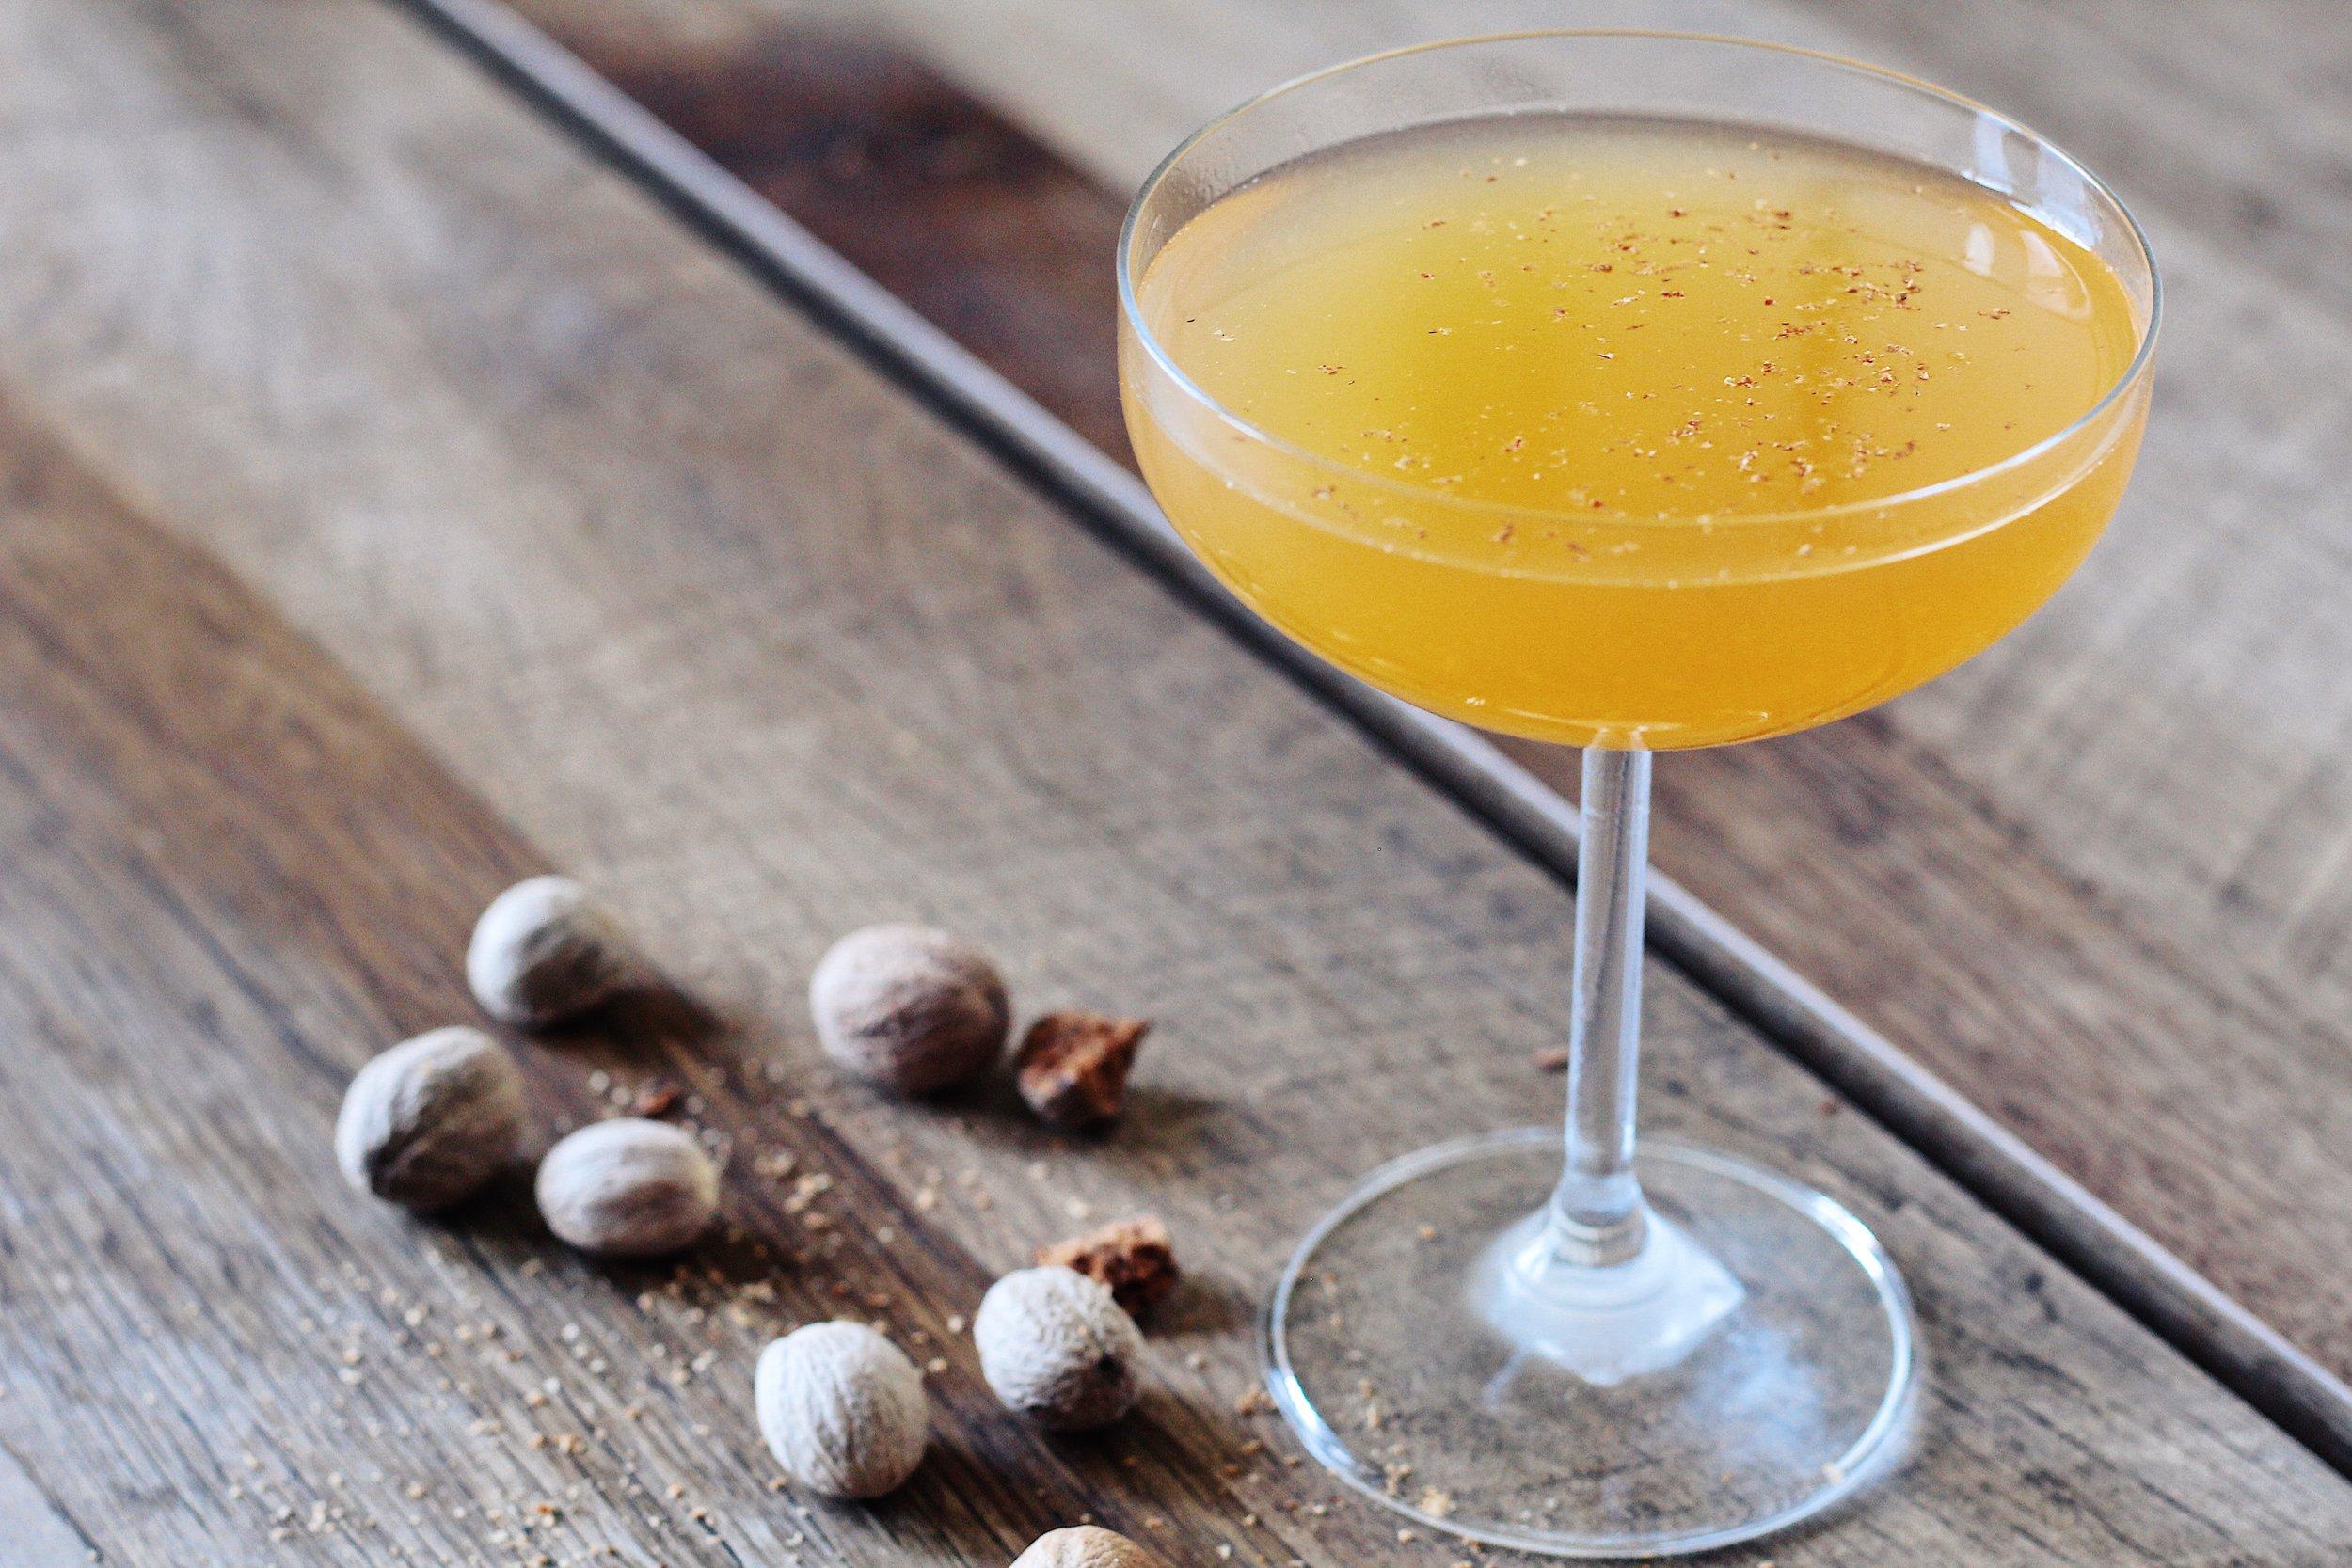 east india cocktail.JPG